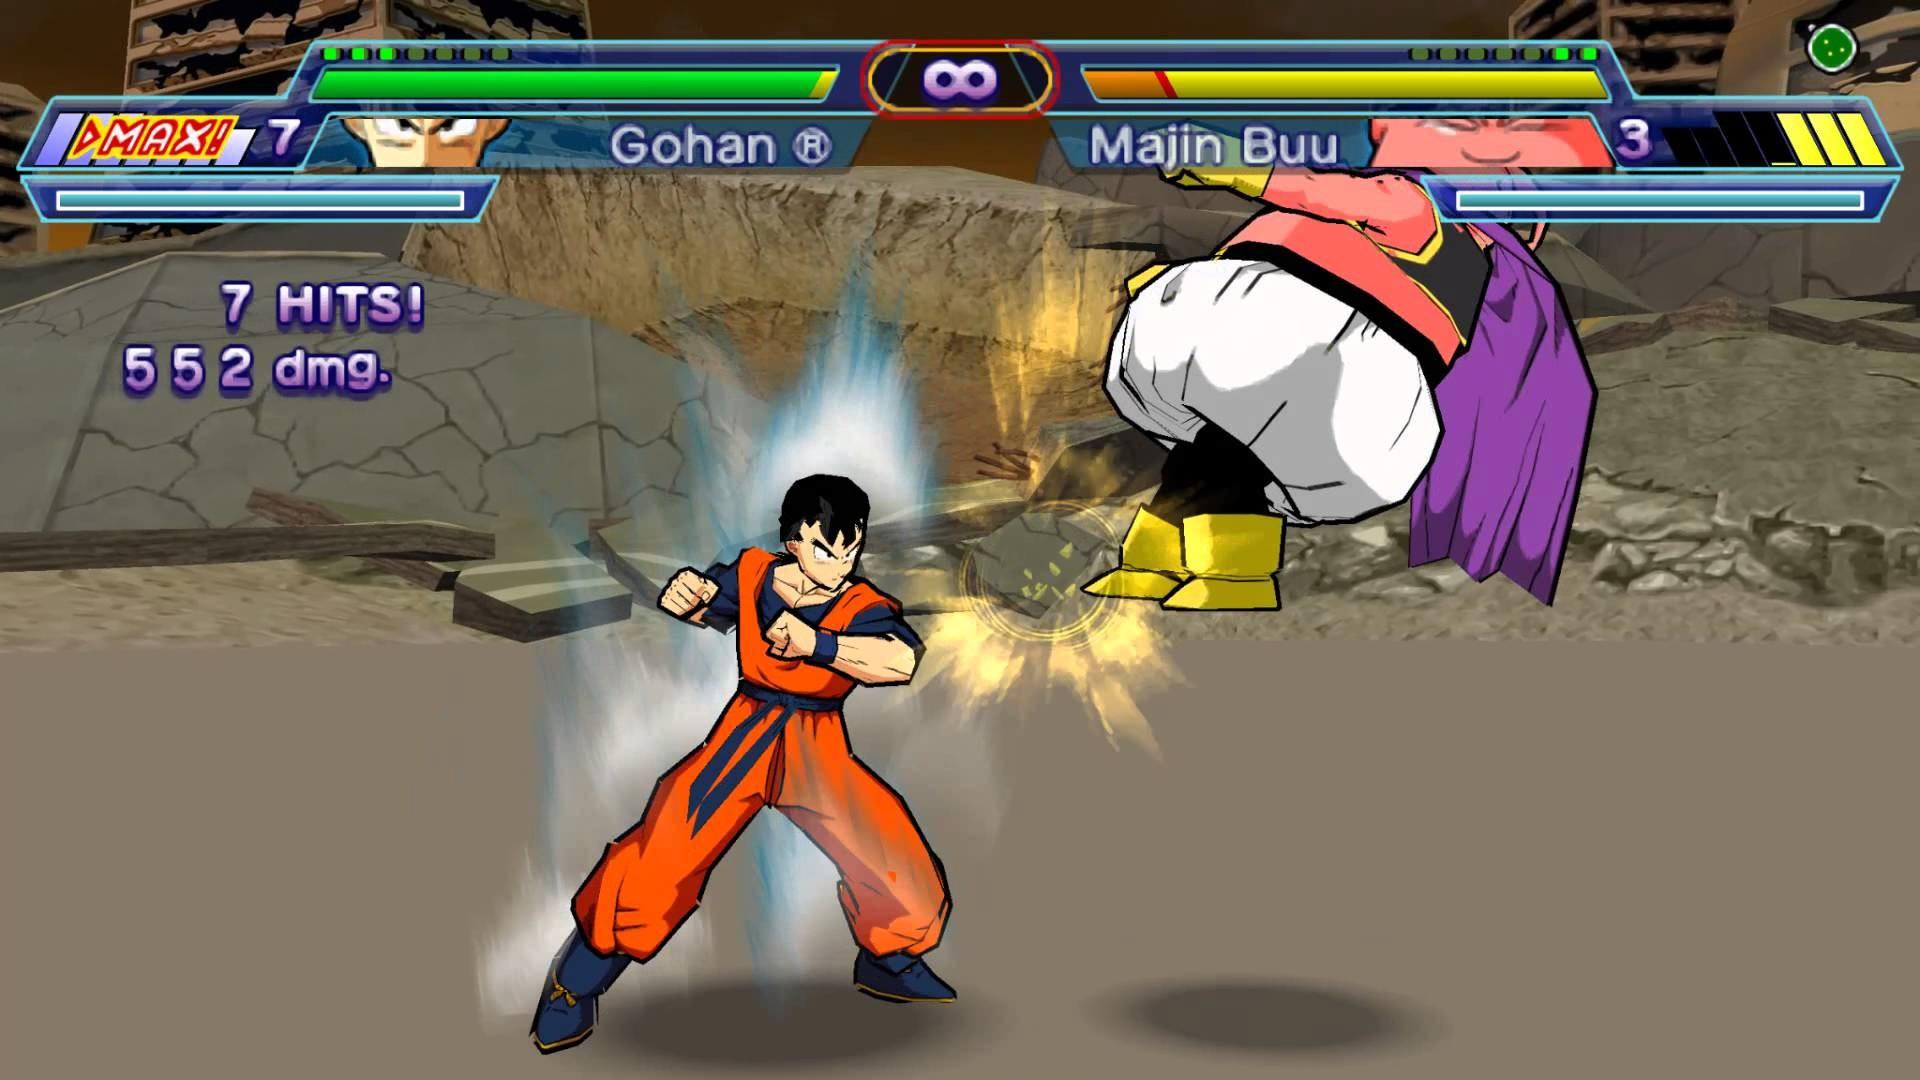 Dragonball Z Shin Budokai Another Road (PSP) – Future Gohan vs Majin Buu